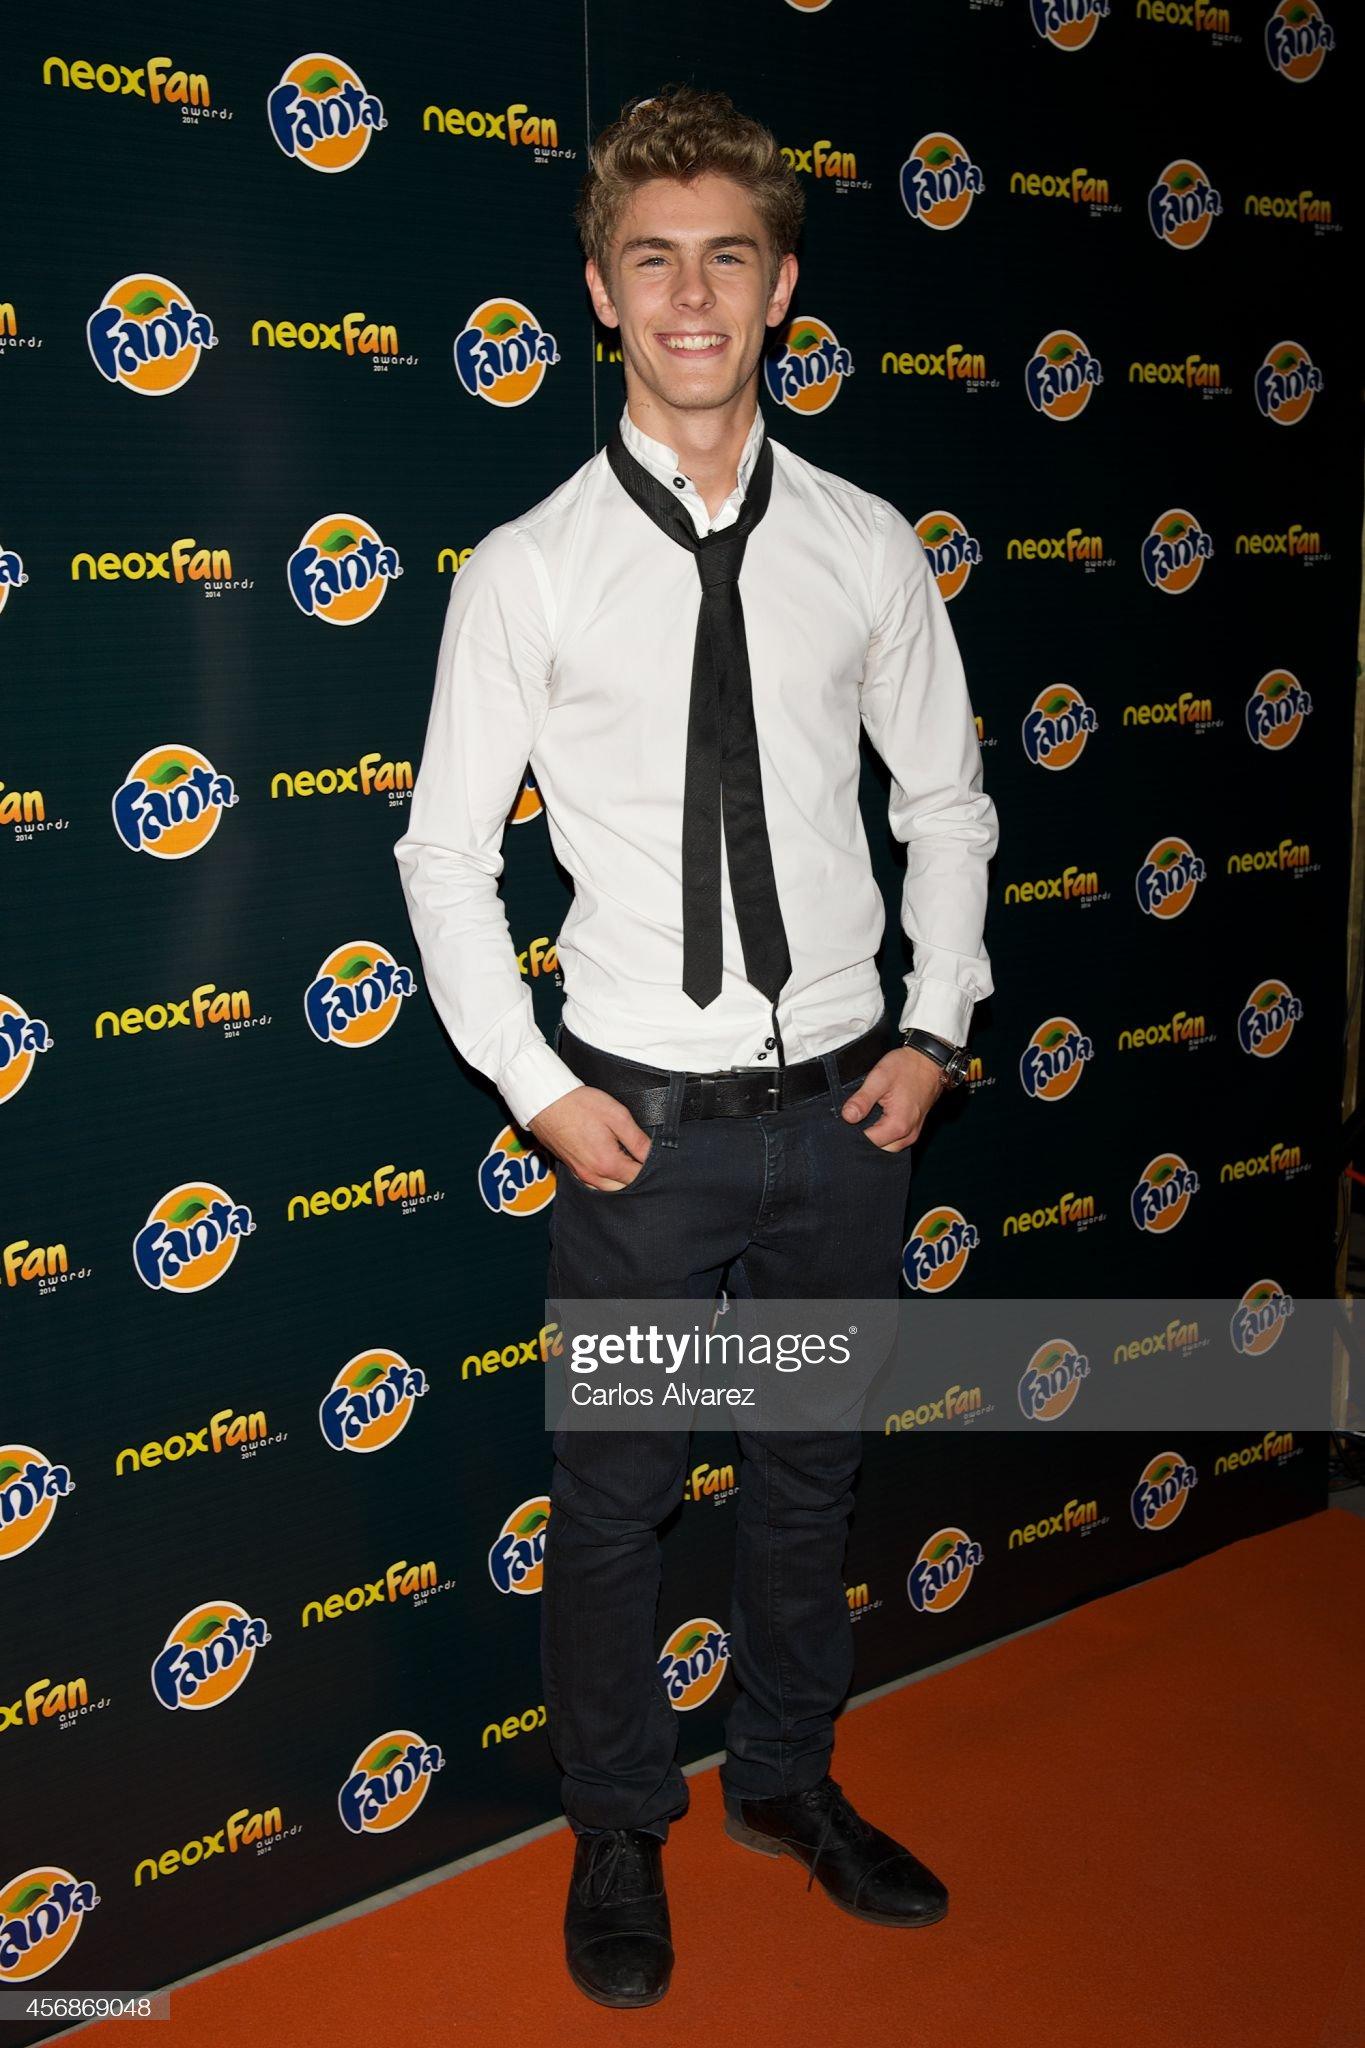 ¿Cuánto mide Patrick Criado? - Altura Spanish-actor-patrick-criado-attends-the-neox-fan-awards-2014-at-the-picture-id456869048?s=2048x2048